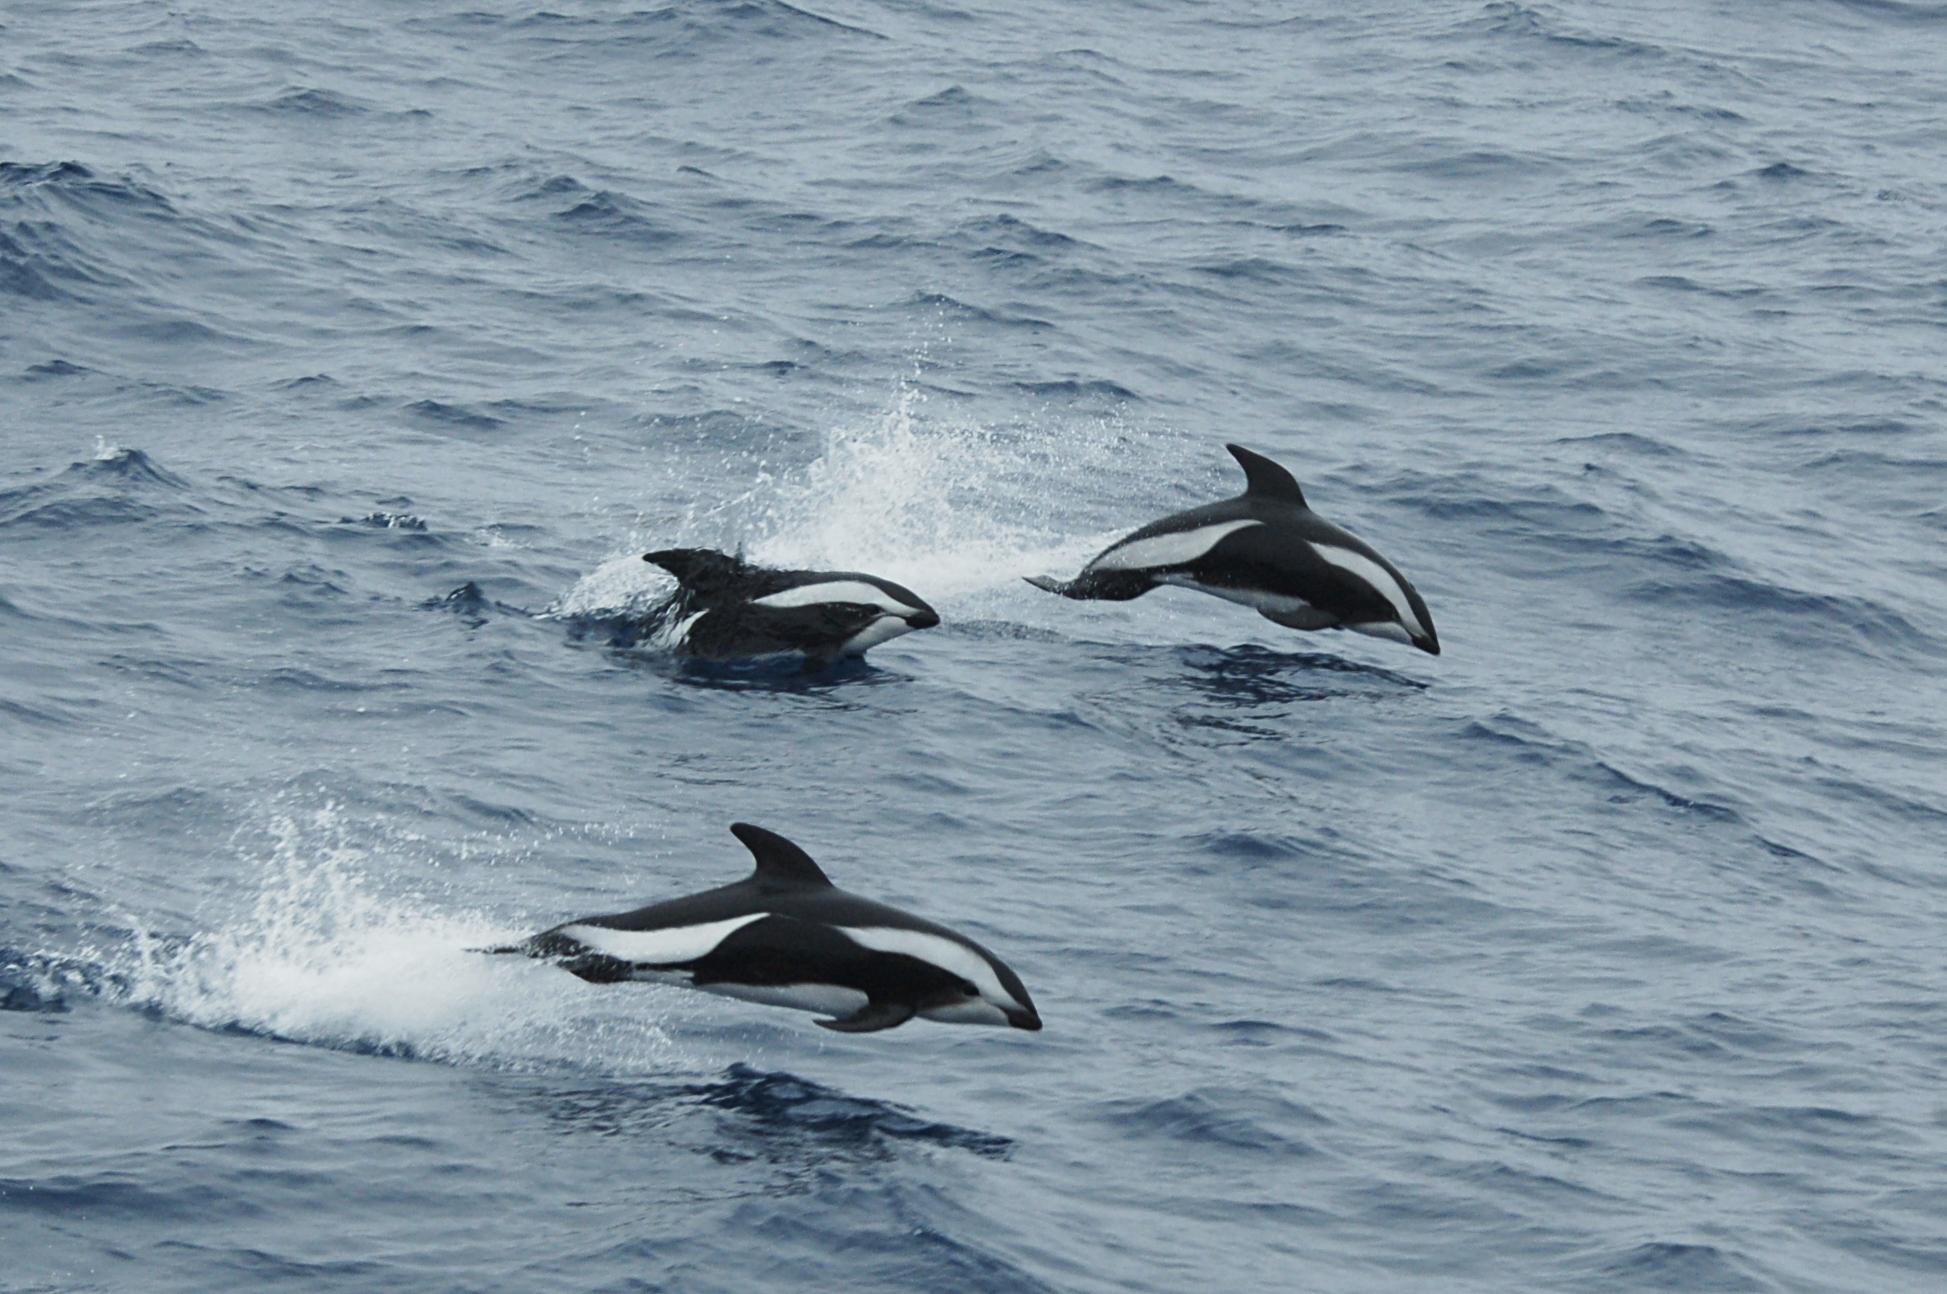 Hourglass dolphin (Lagenorhynchus cruciger)